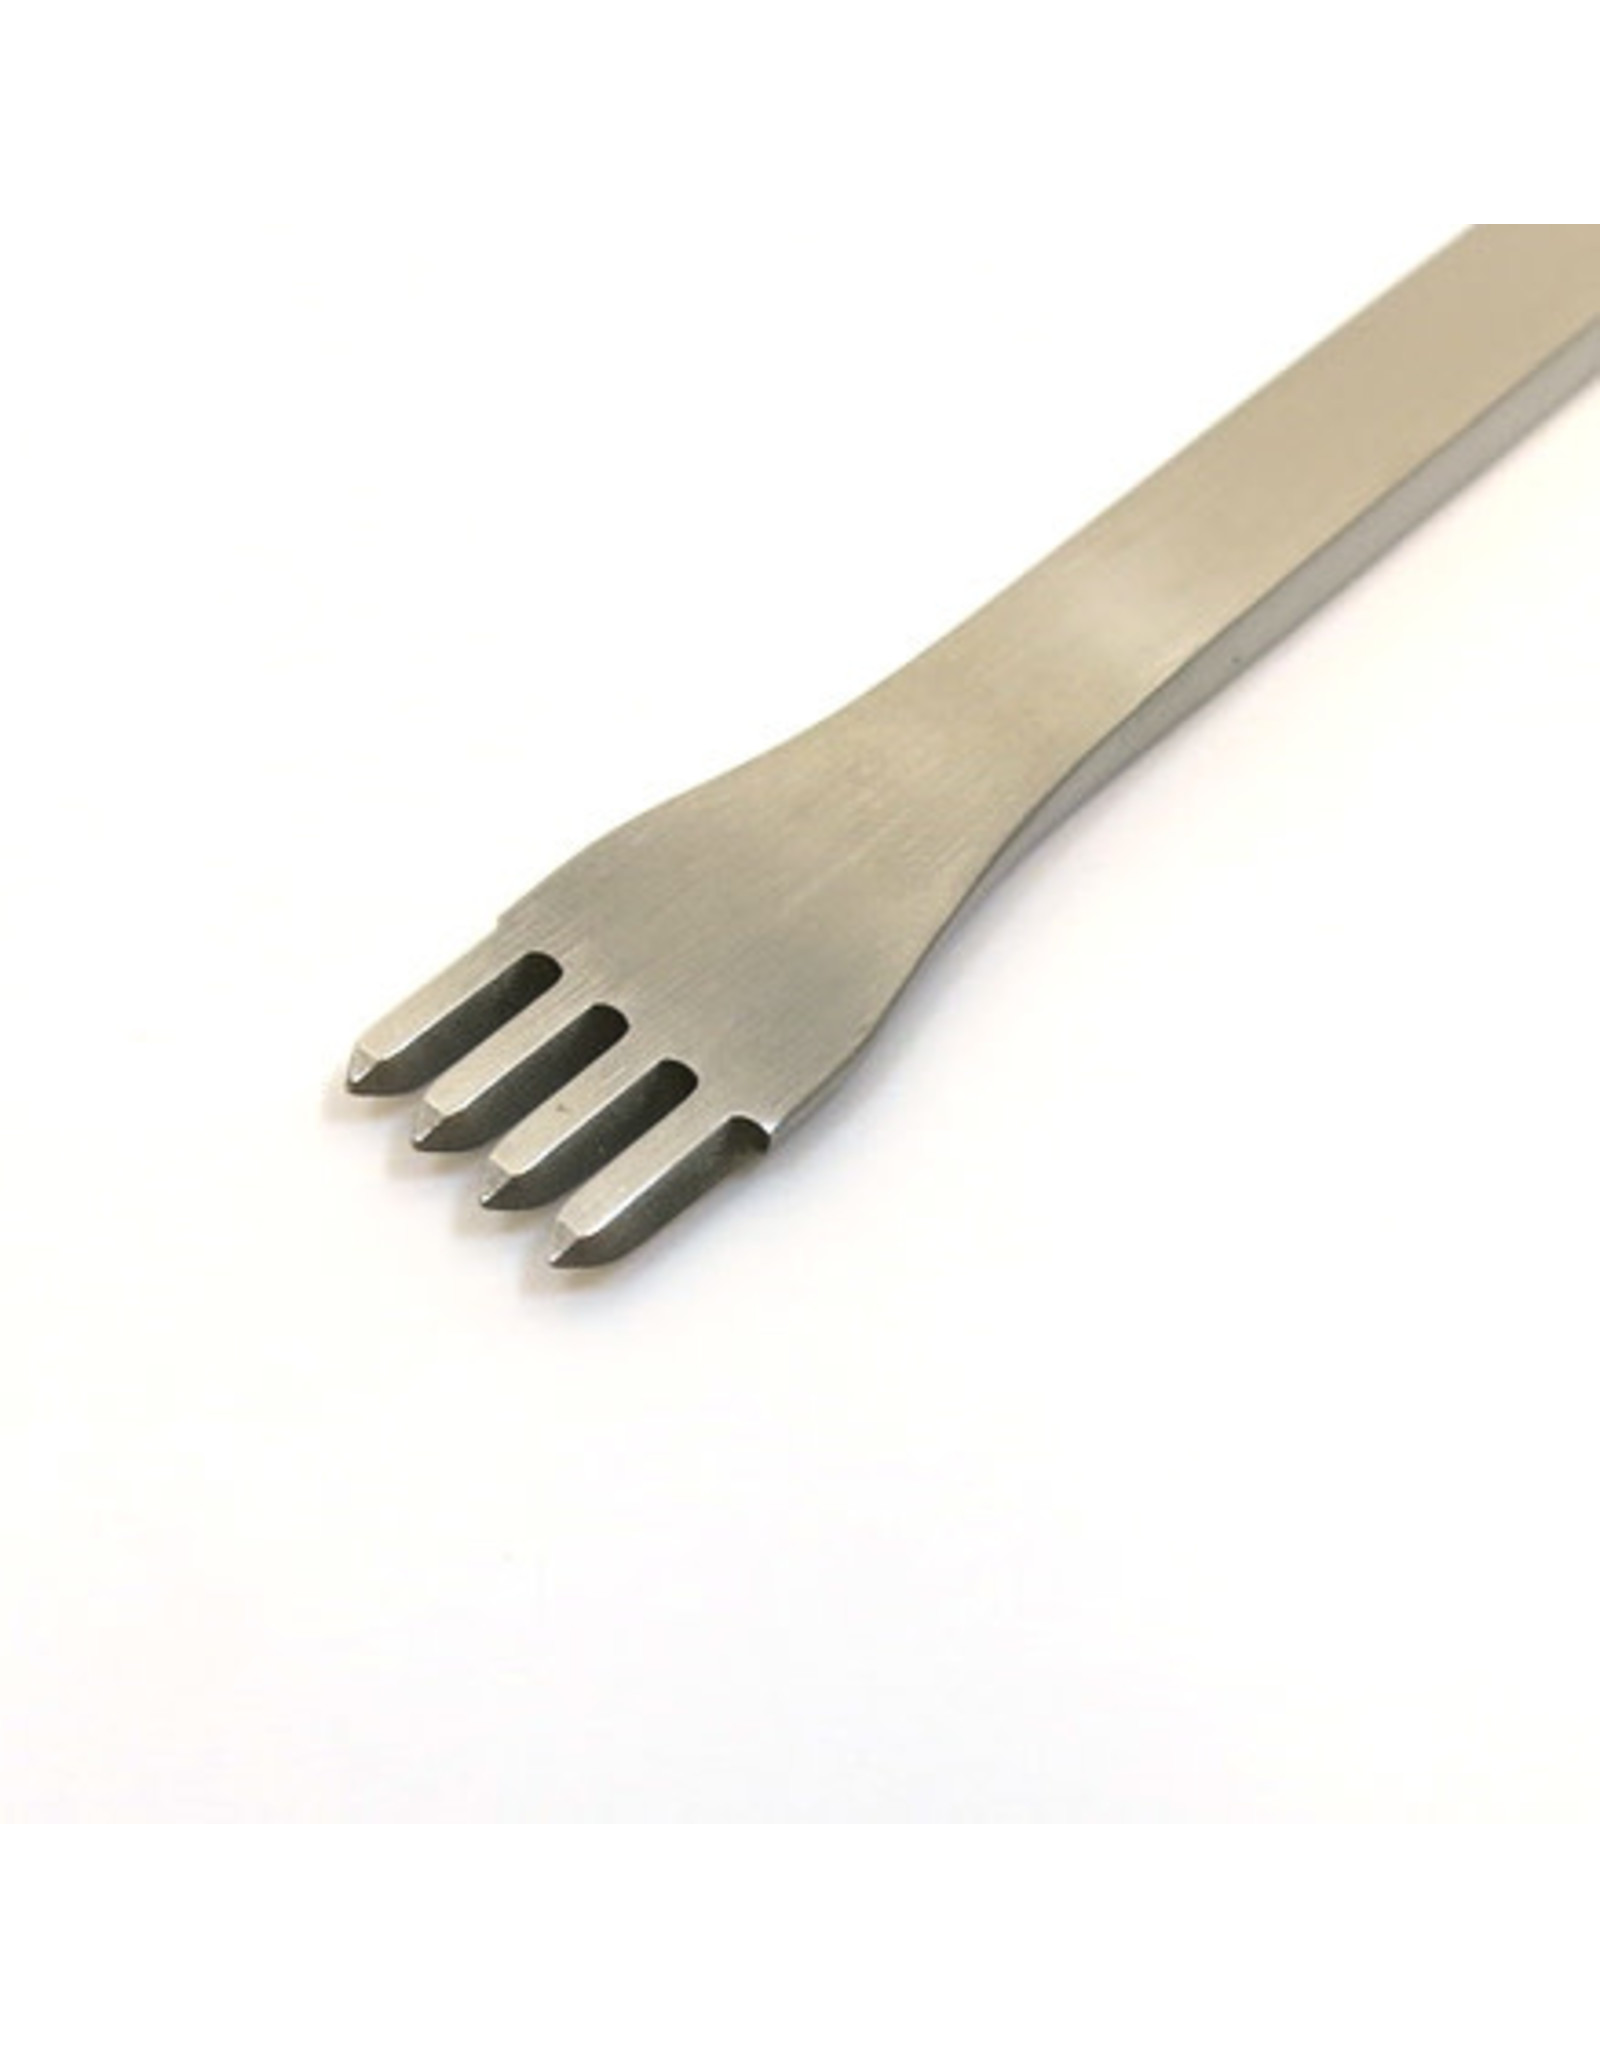 Diamond chisel 4-prong 3mm